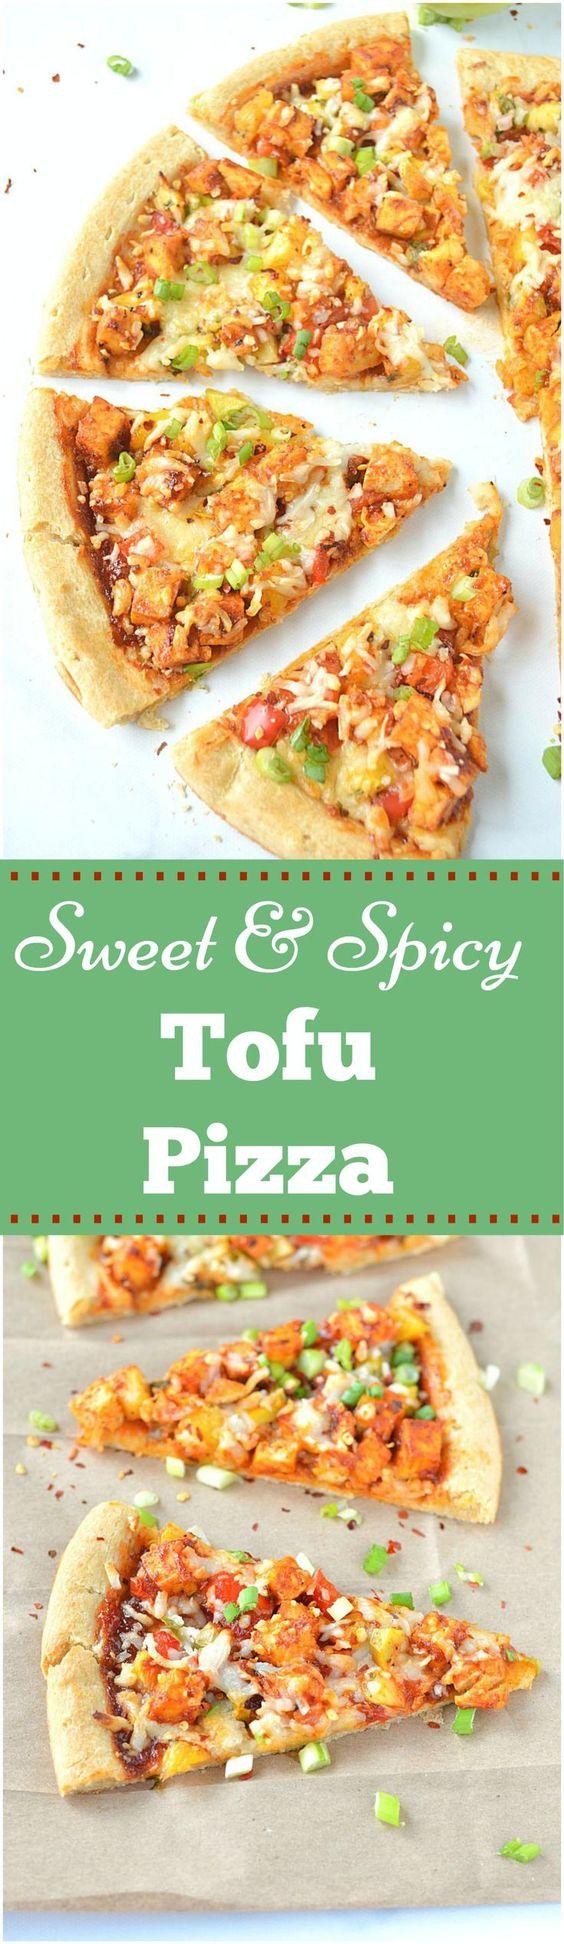 ... jerk tofu and homemade pineapple salsa. So crusty, flavorful and